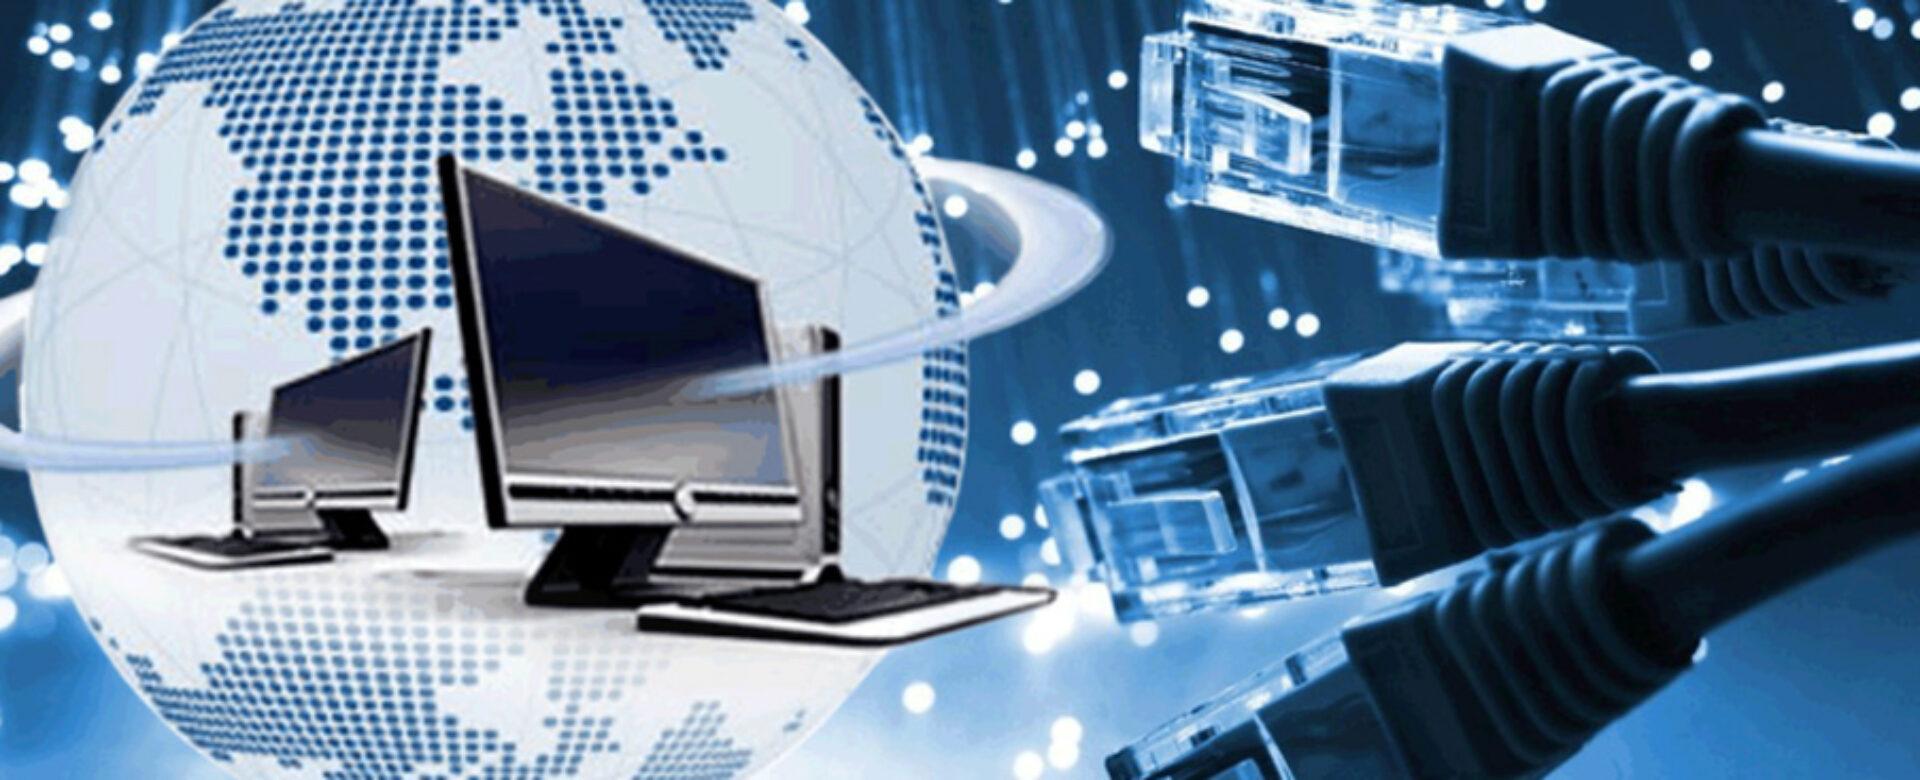 AVB COMPUTER SYSTEMS LTD